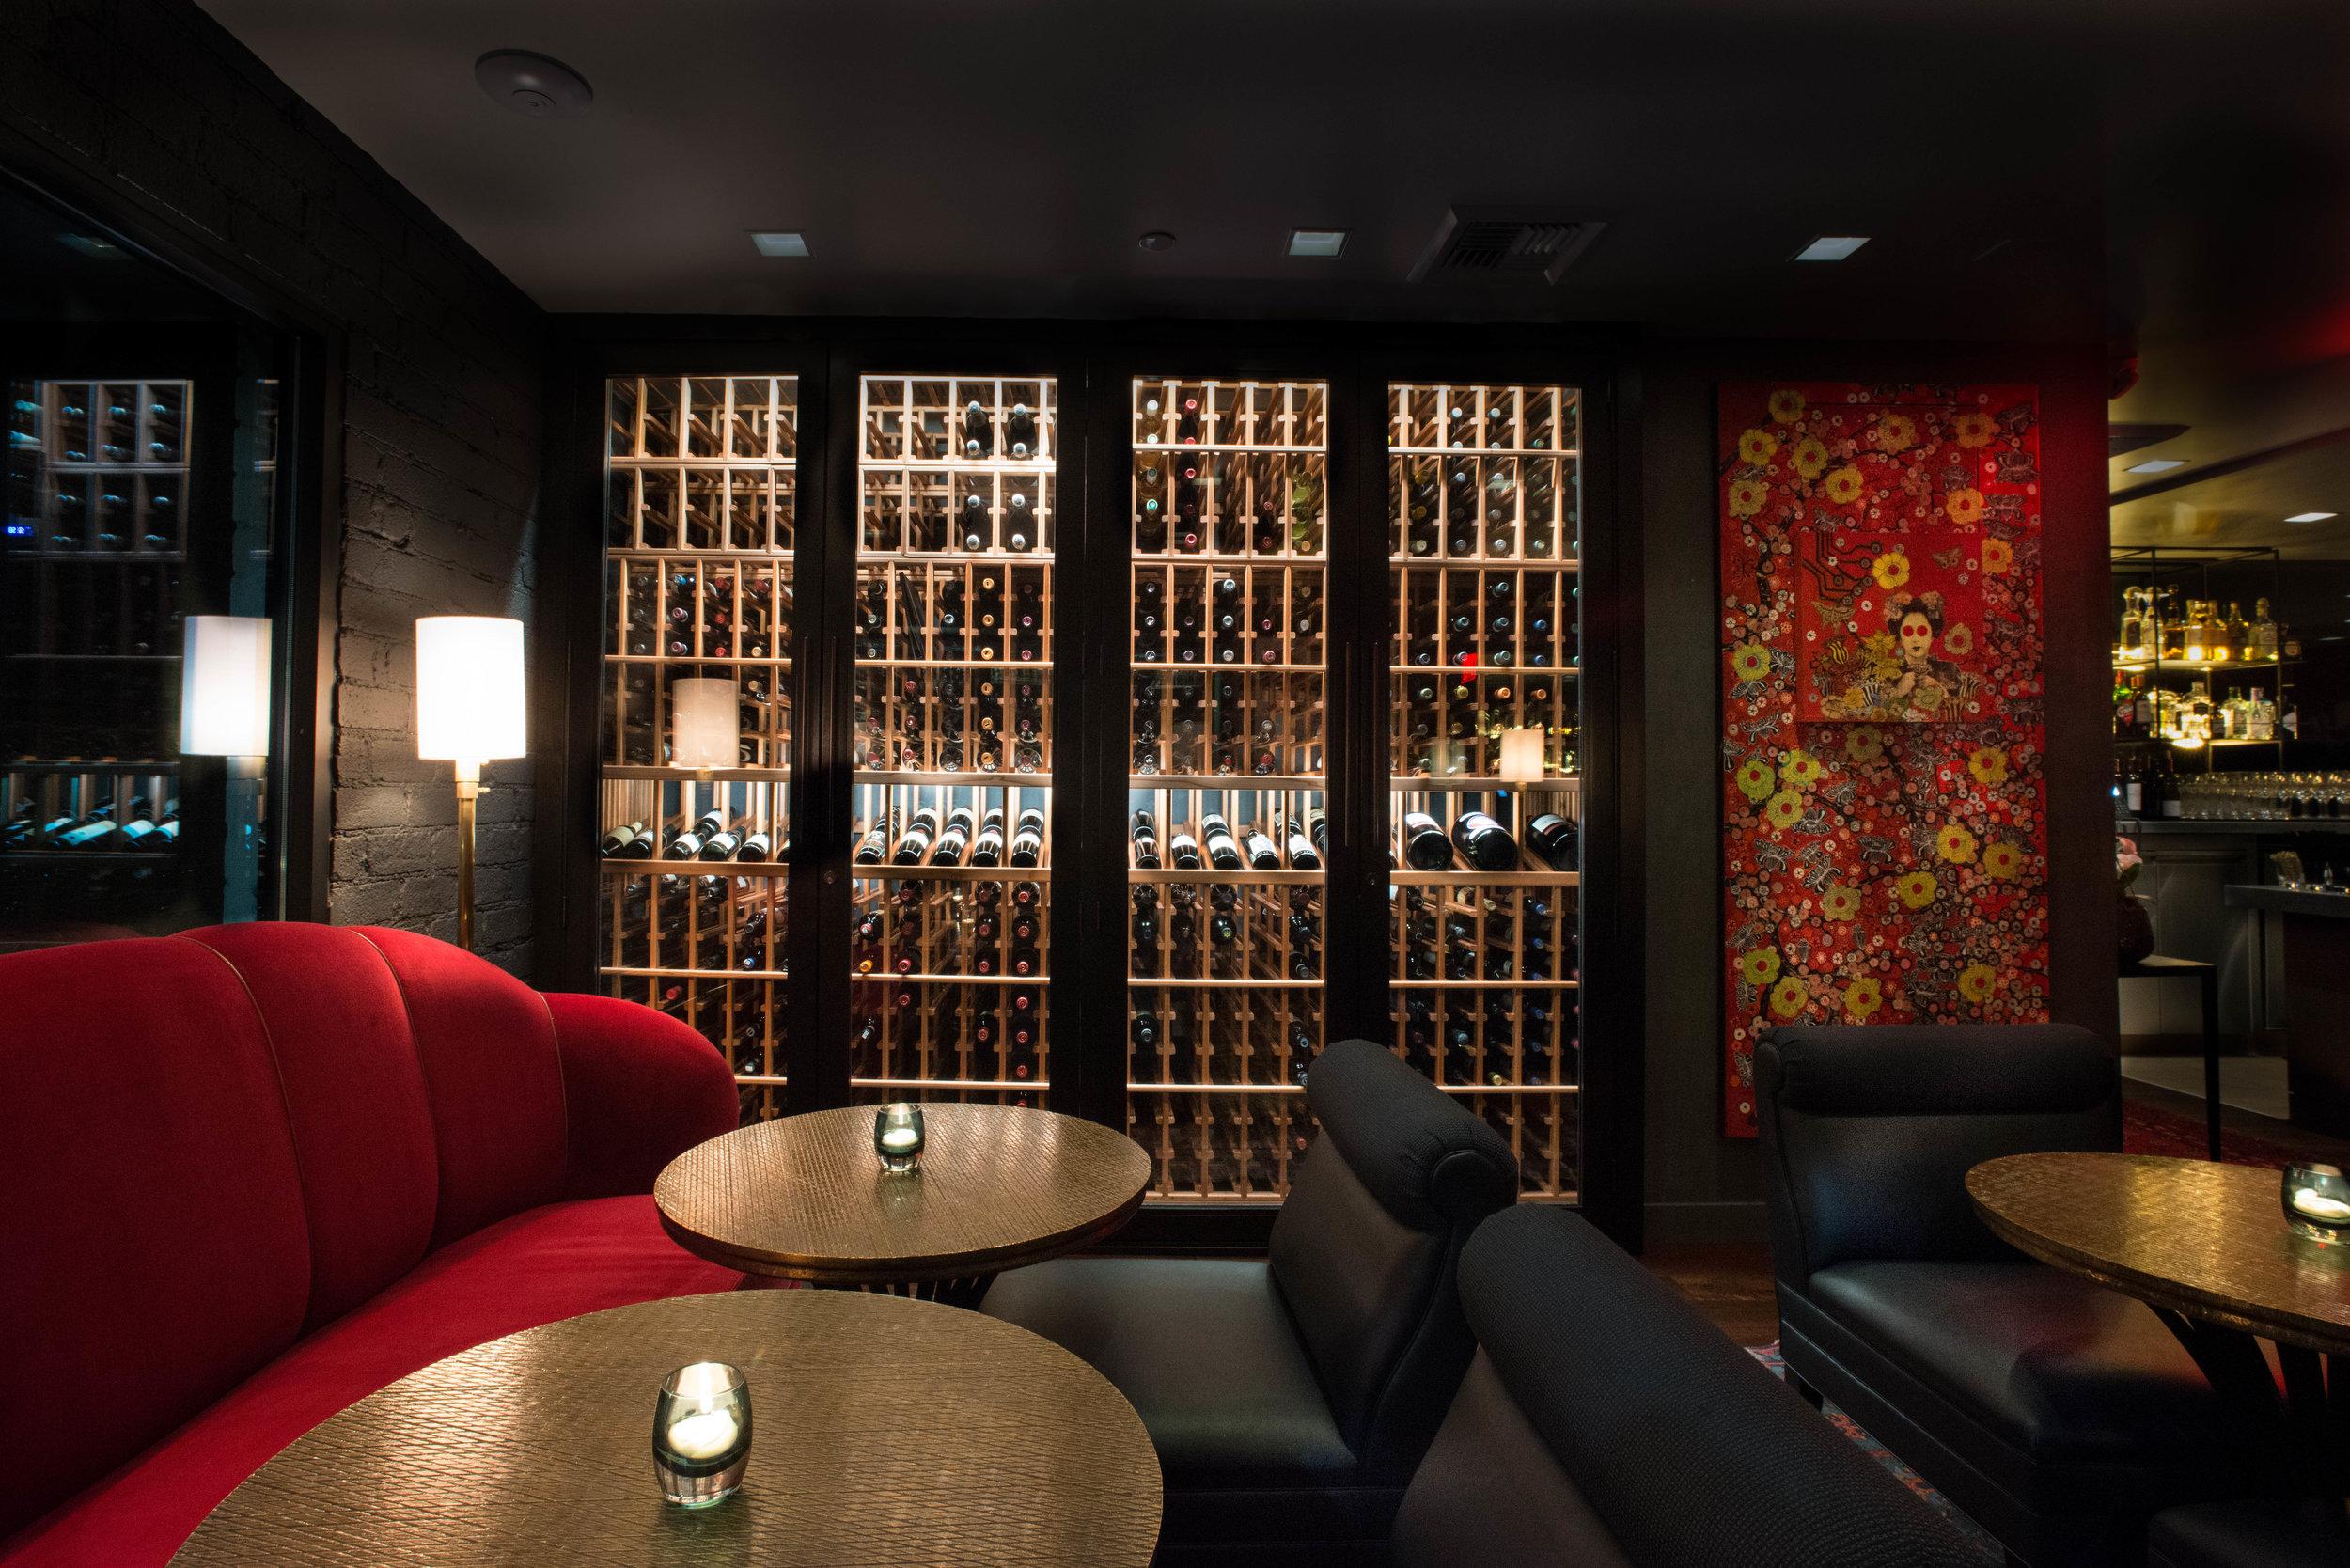 BG Lounge